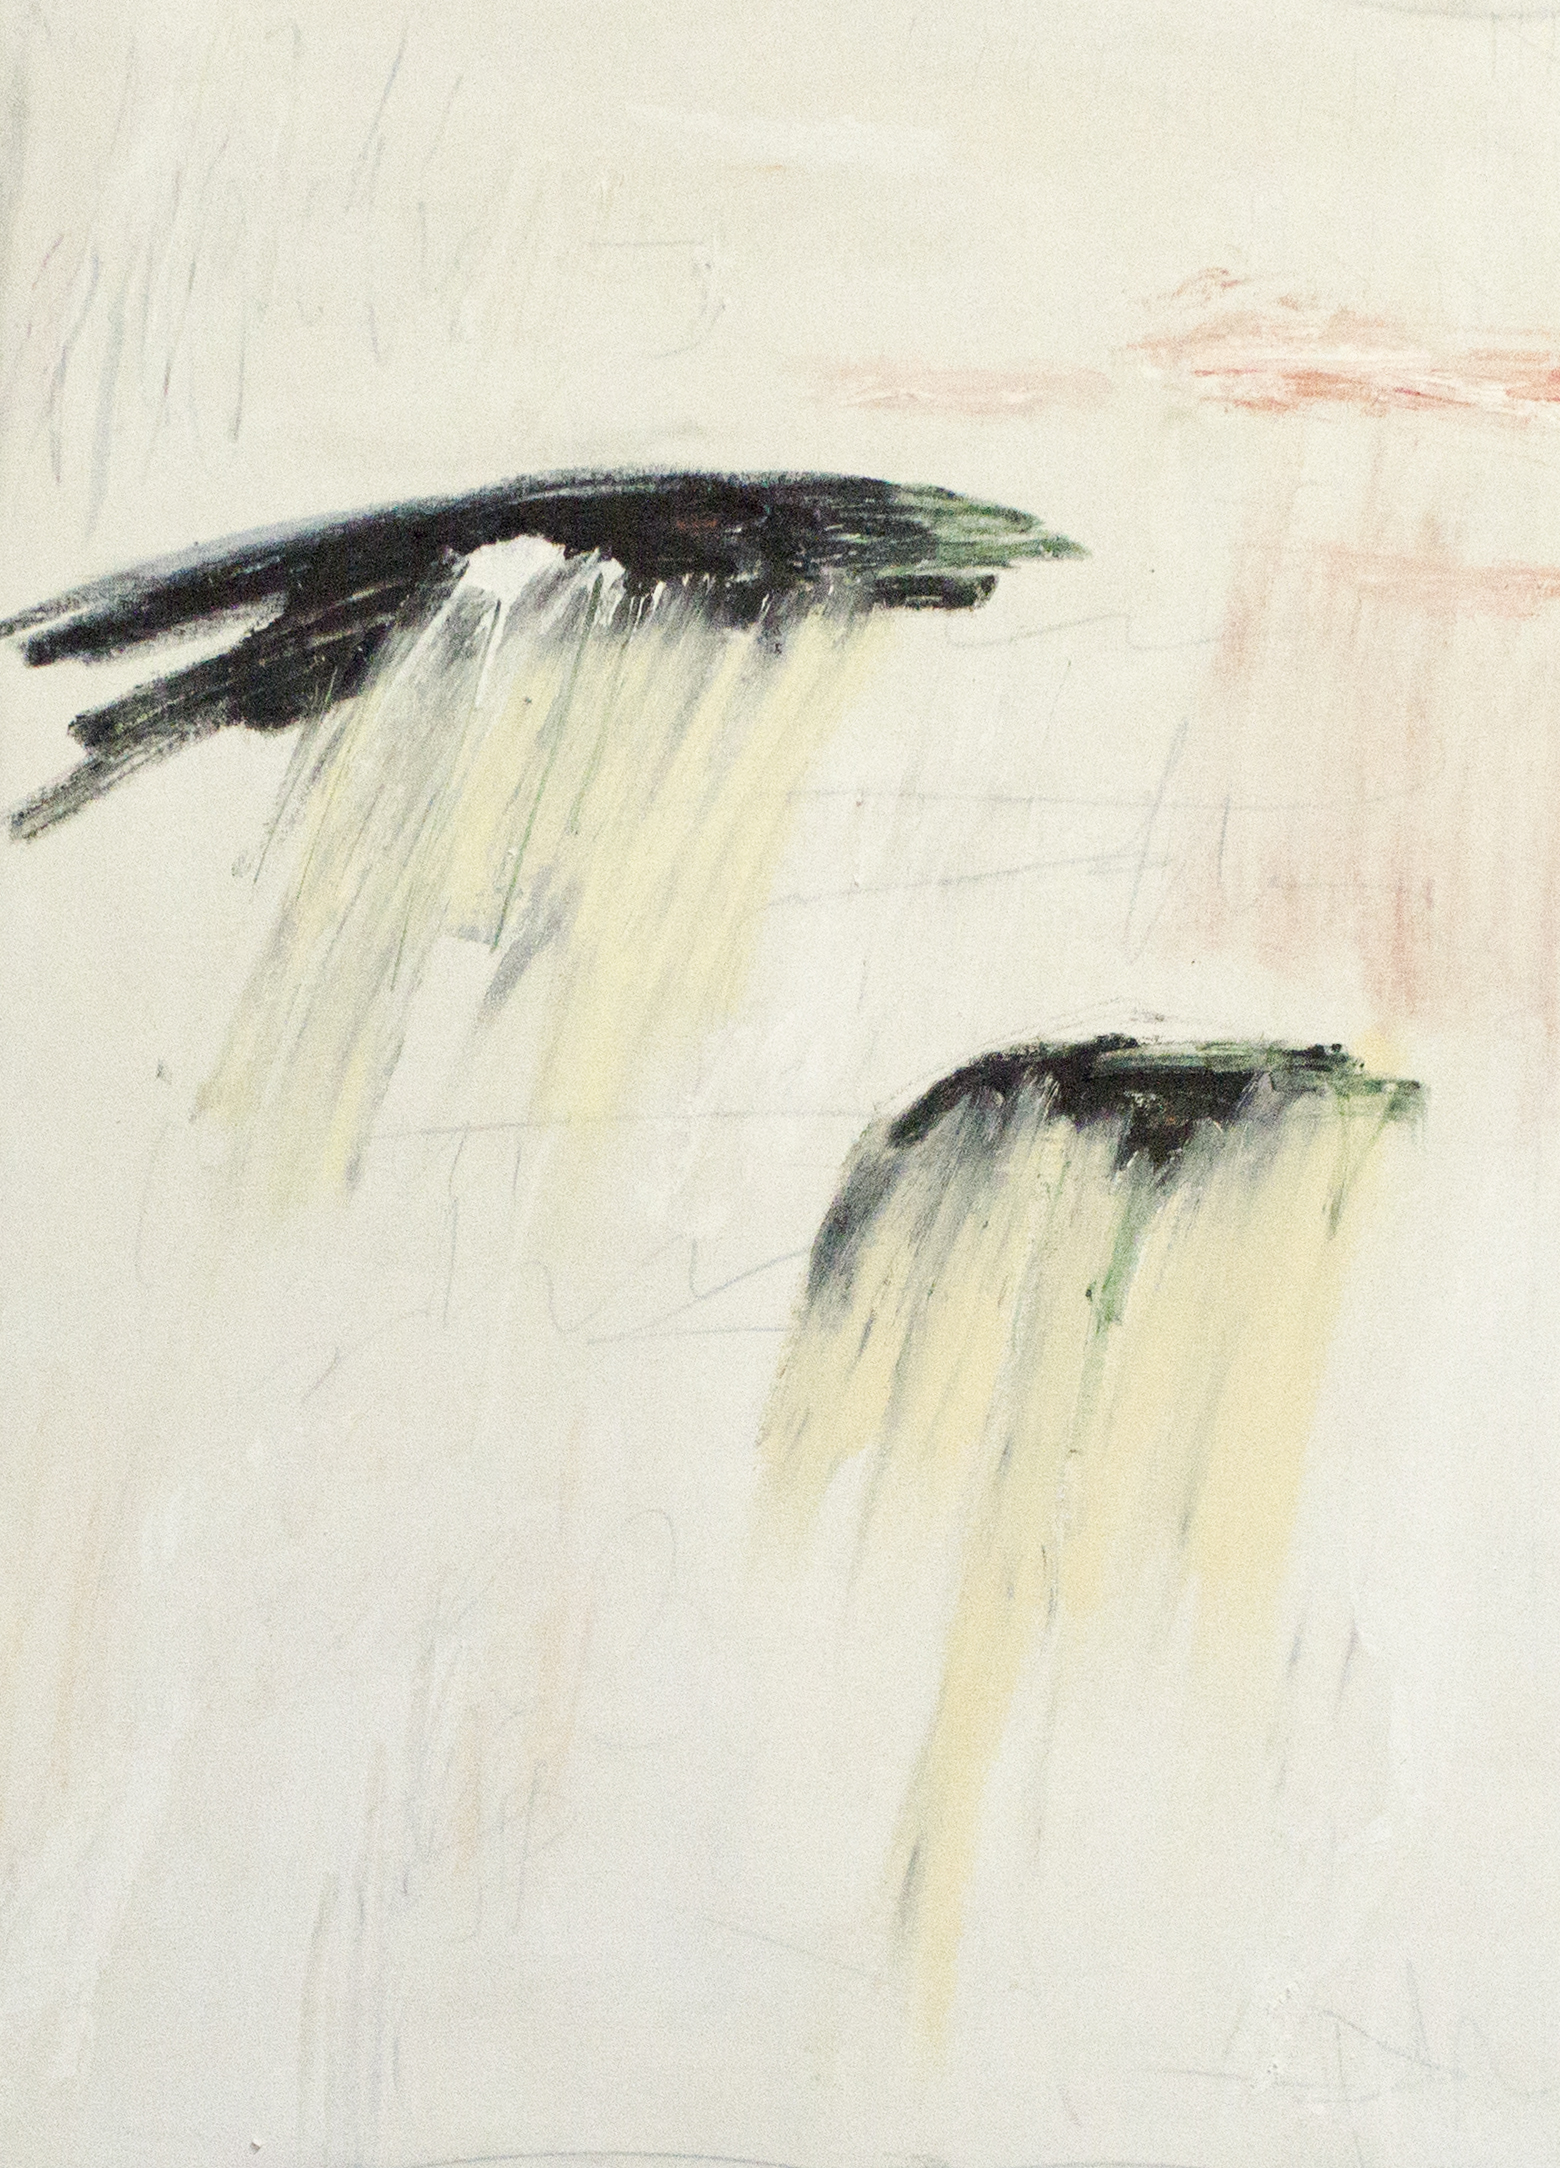 Dolorem et Desperationem,  2018  36 x 26 Inches  Oil, Acrylic, Oil Stick, Colored Pencil, Graphite and Crayon on Canvas